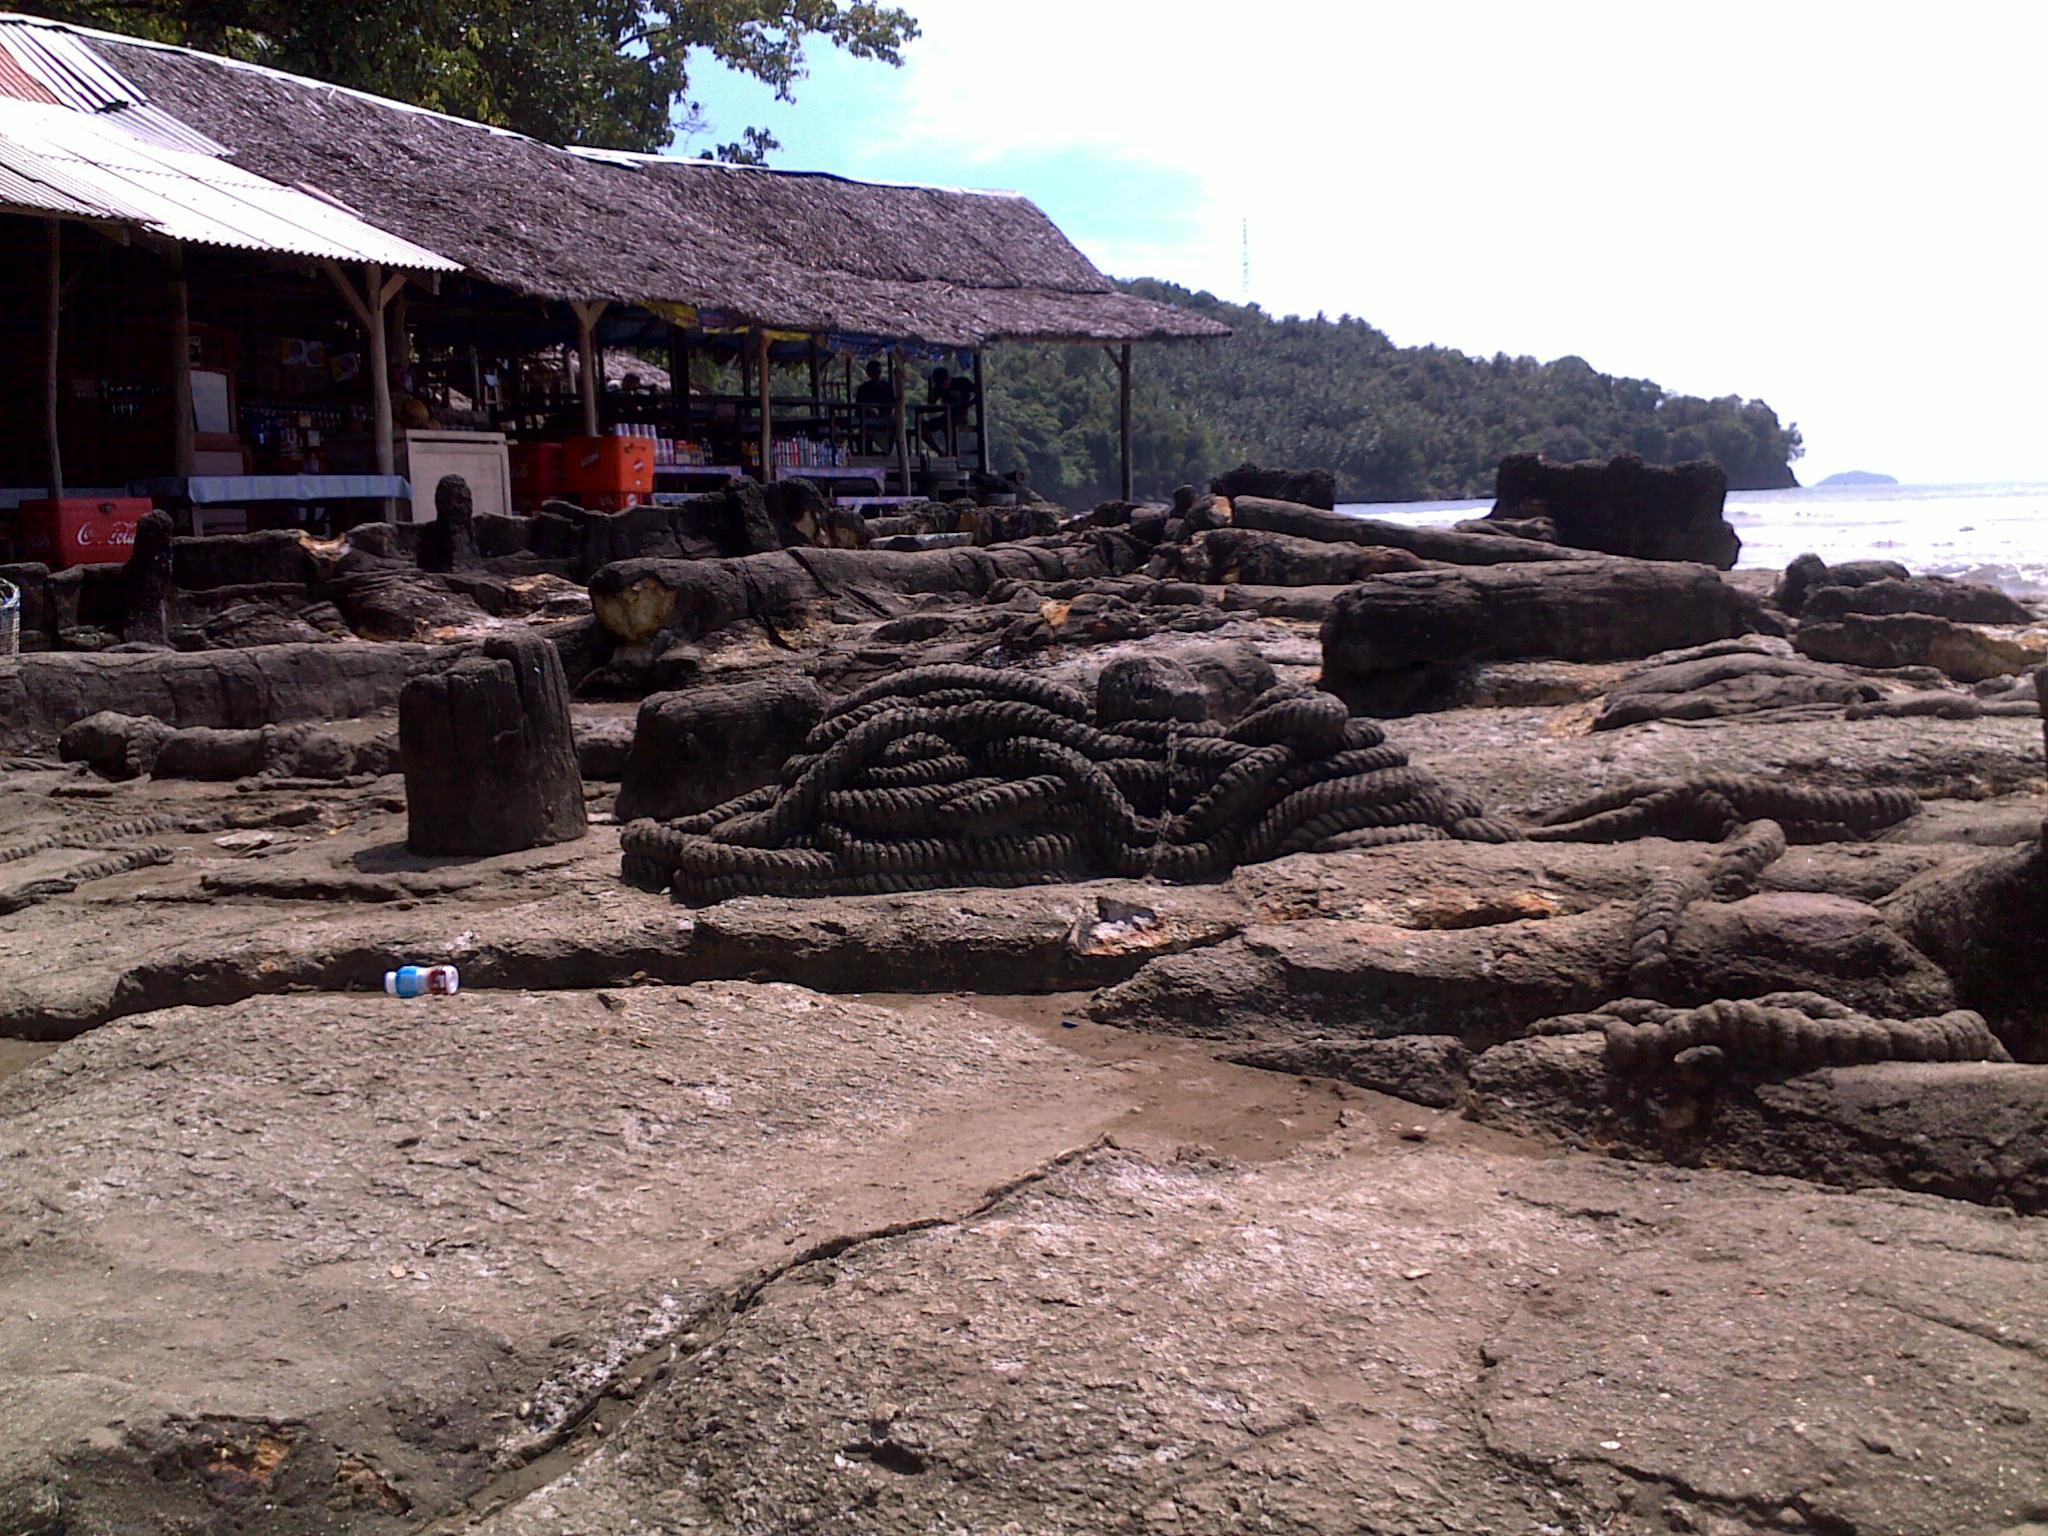 Malin Kundang di Pantai Air Manis, Padang Naska Drama Legenda Surabaya